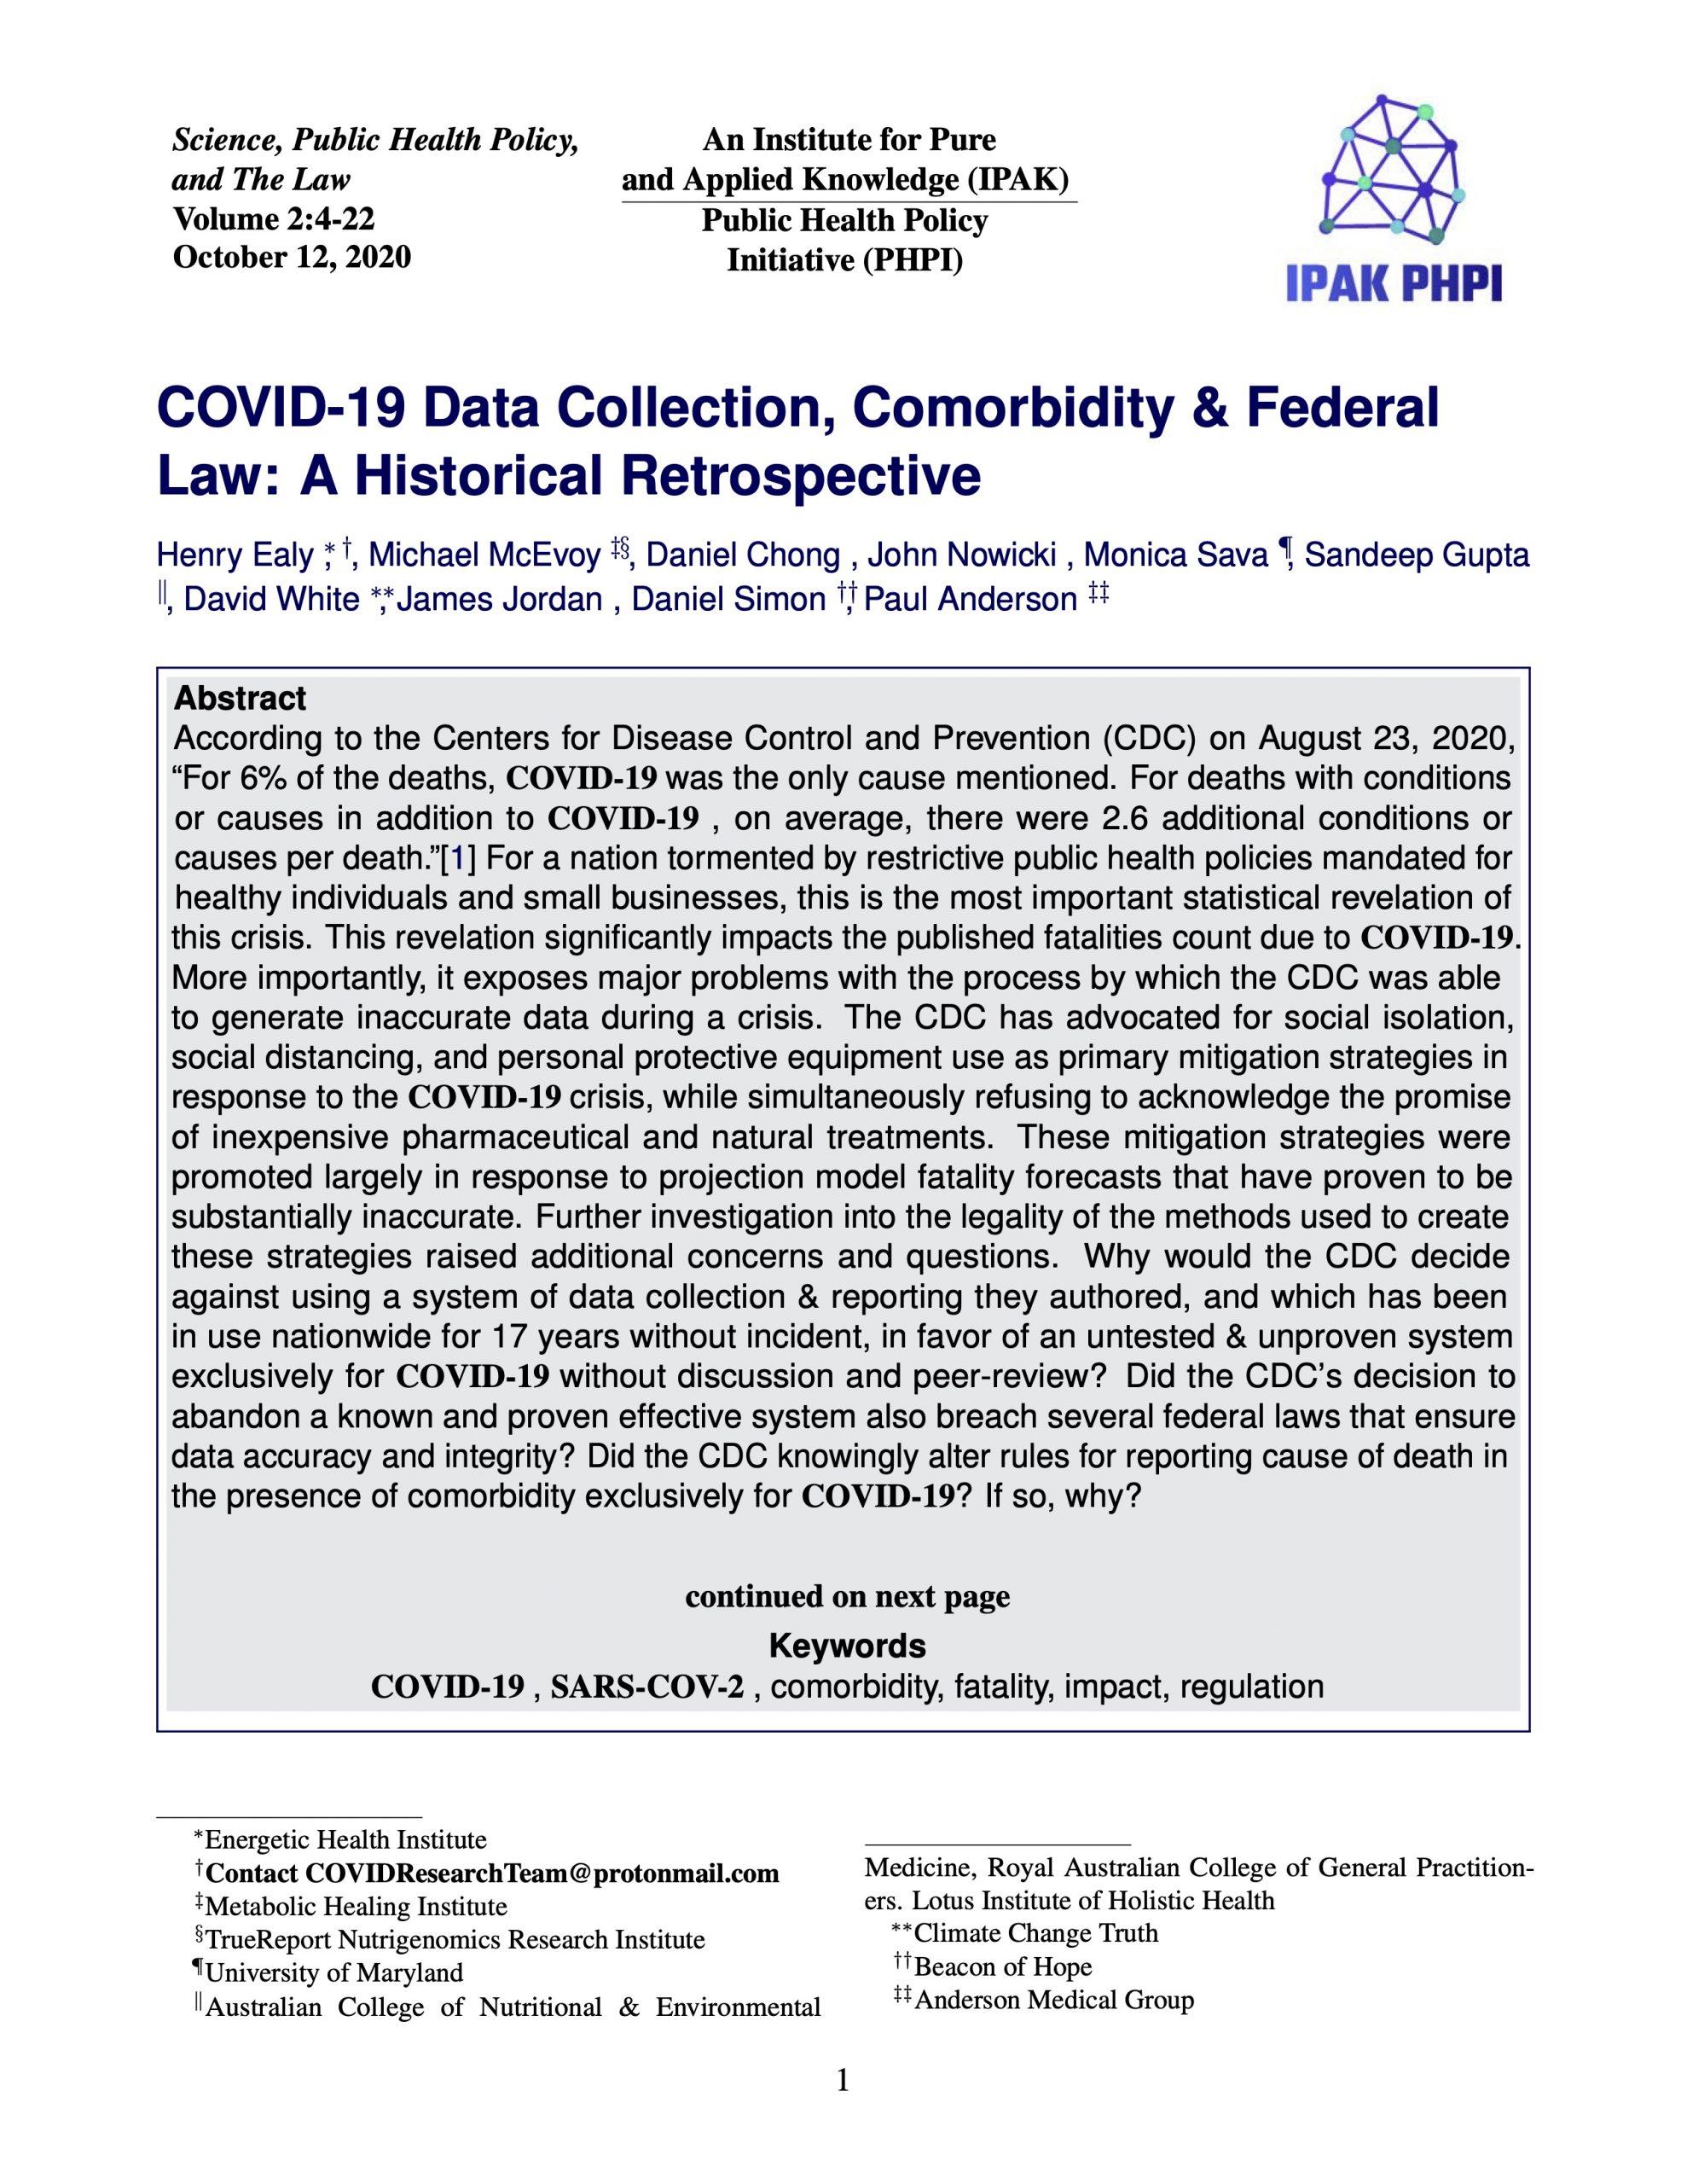 COVID-19 Data Collection, Comorbidity & Federal Law